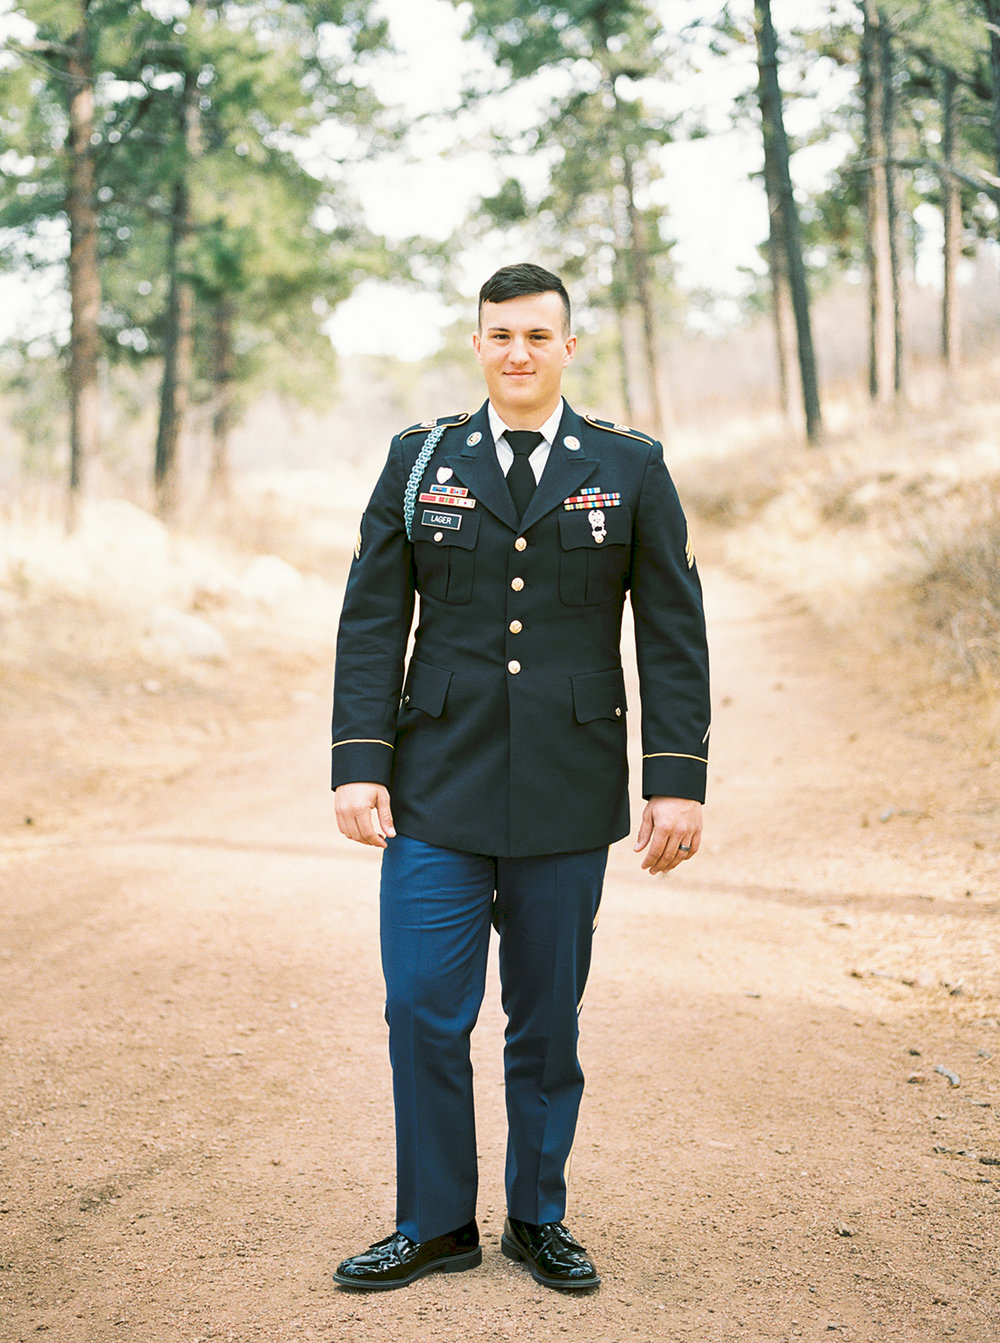 colorado-springs-military-wedding-skylar-rain-photography-j-d-1.jpg